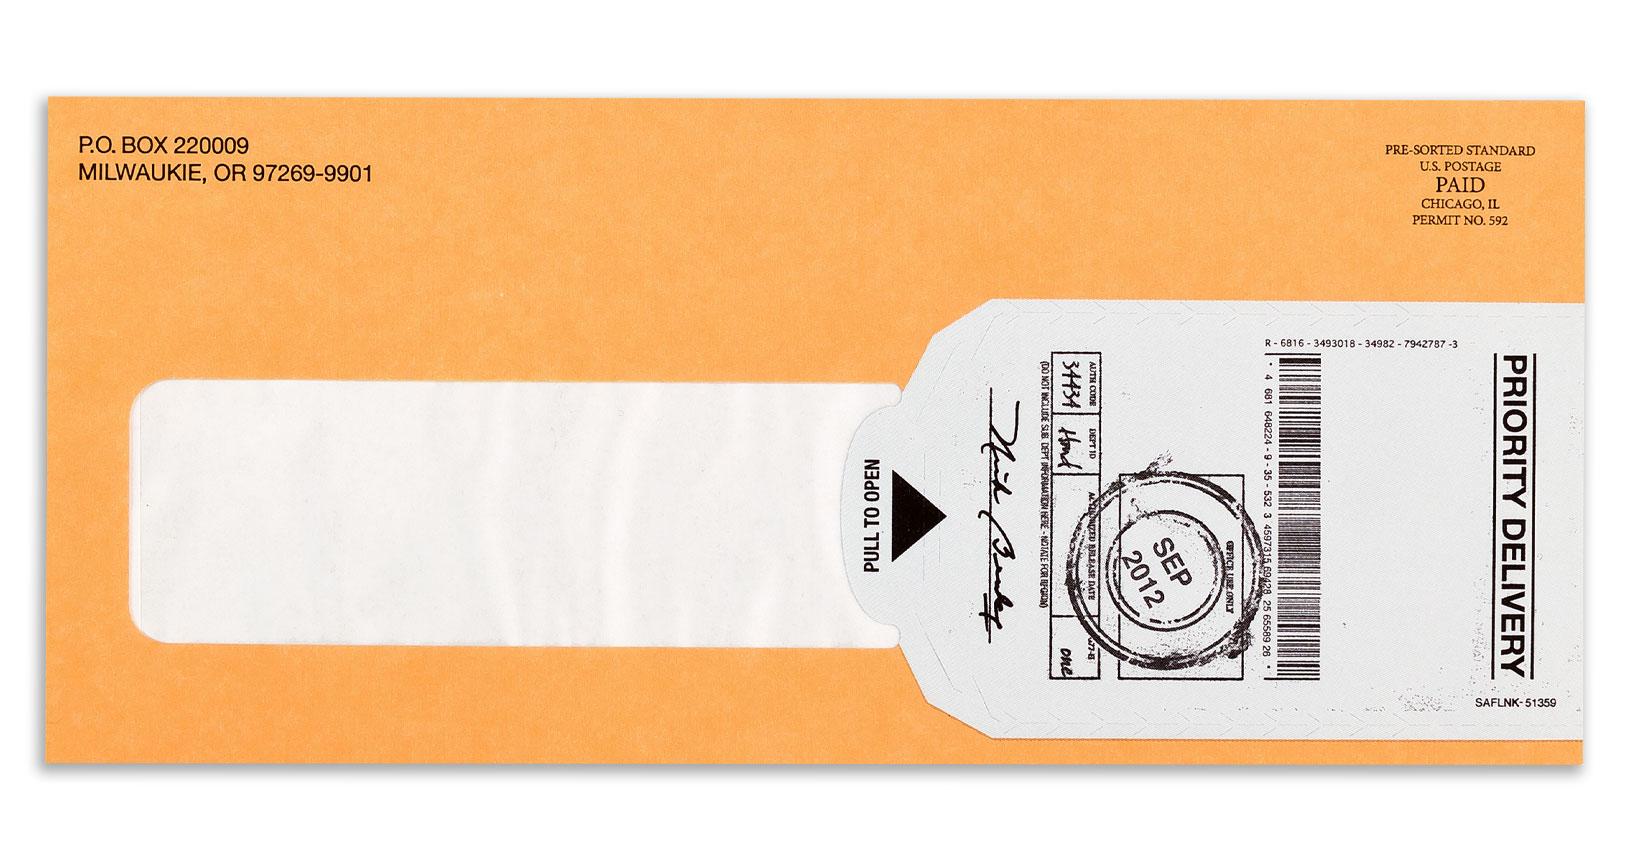 Reveal Envelope Example